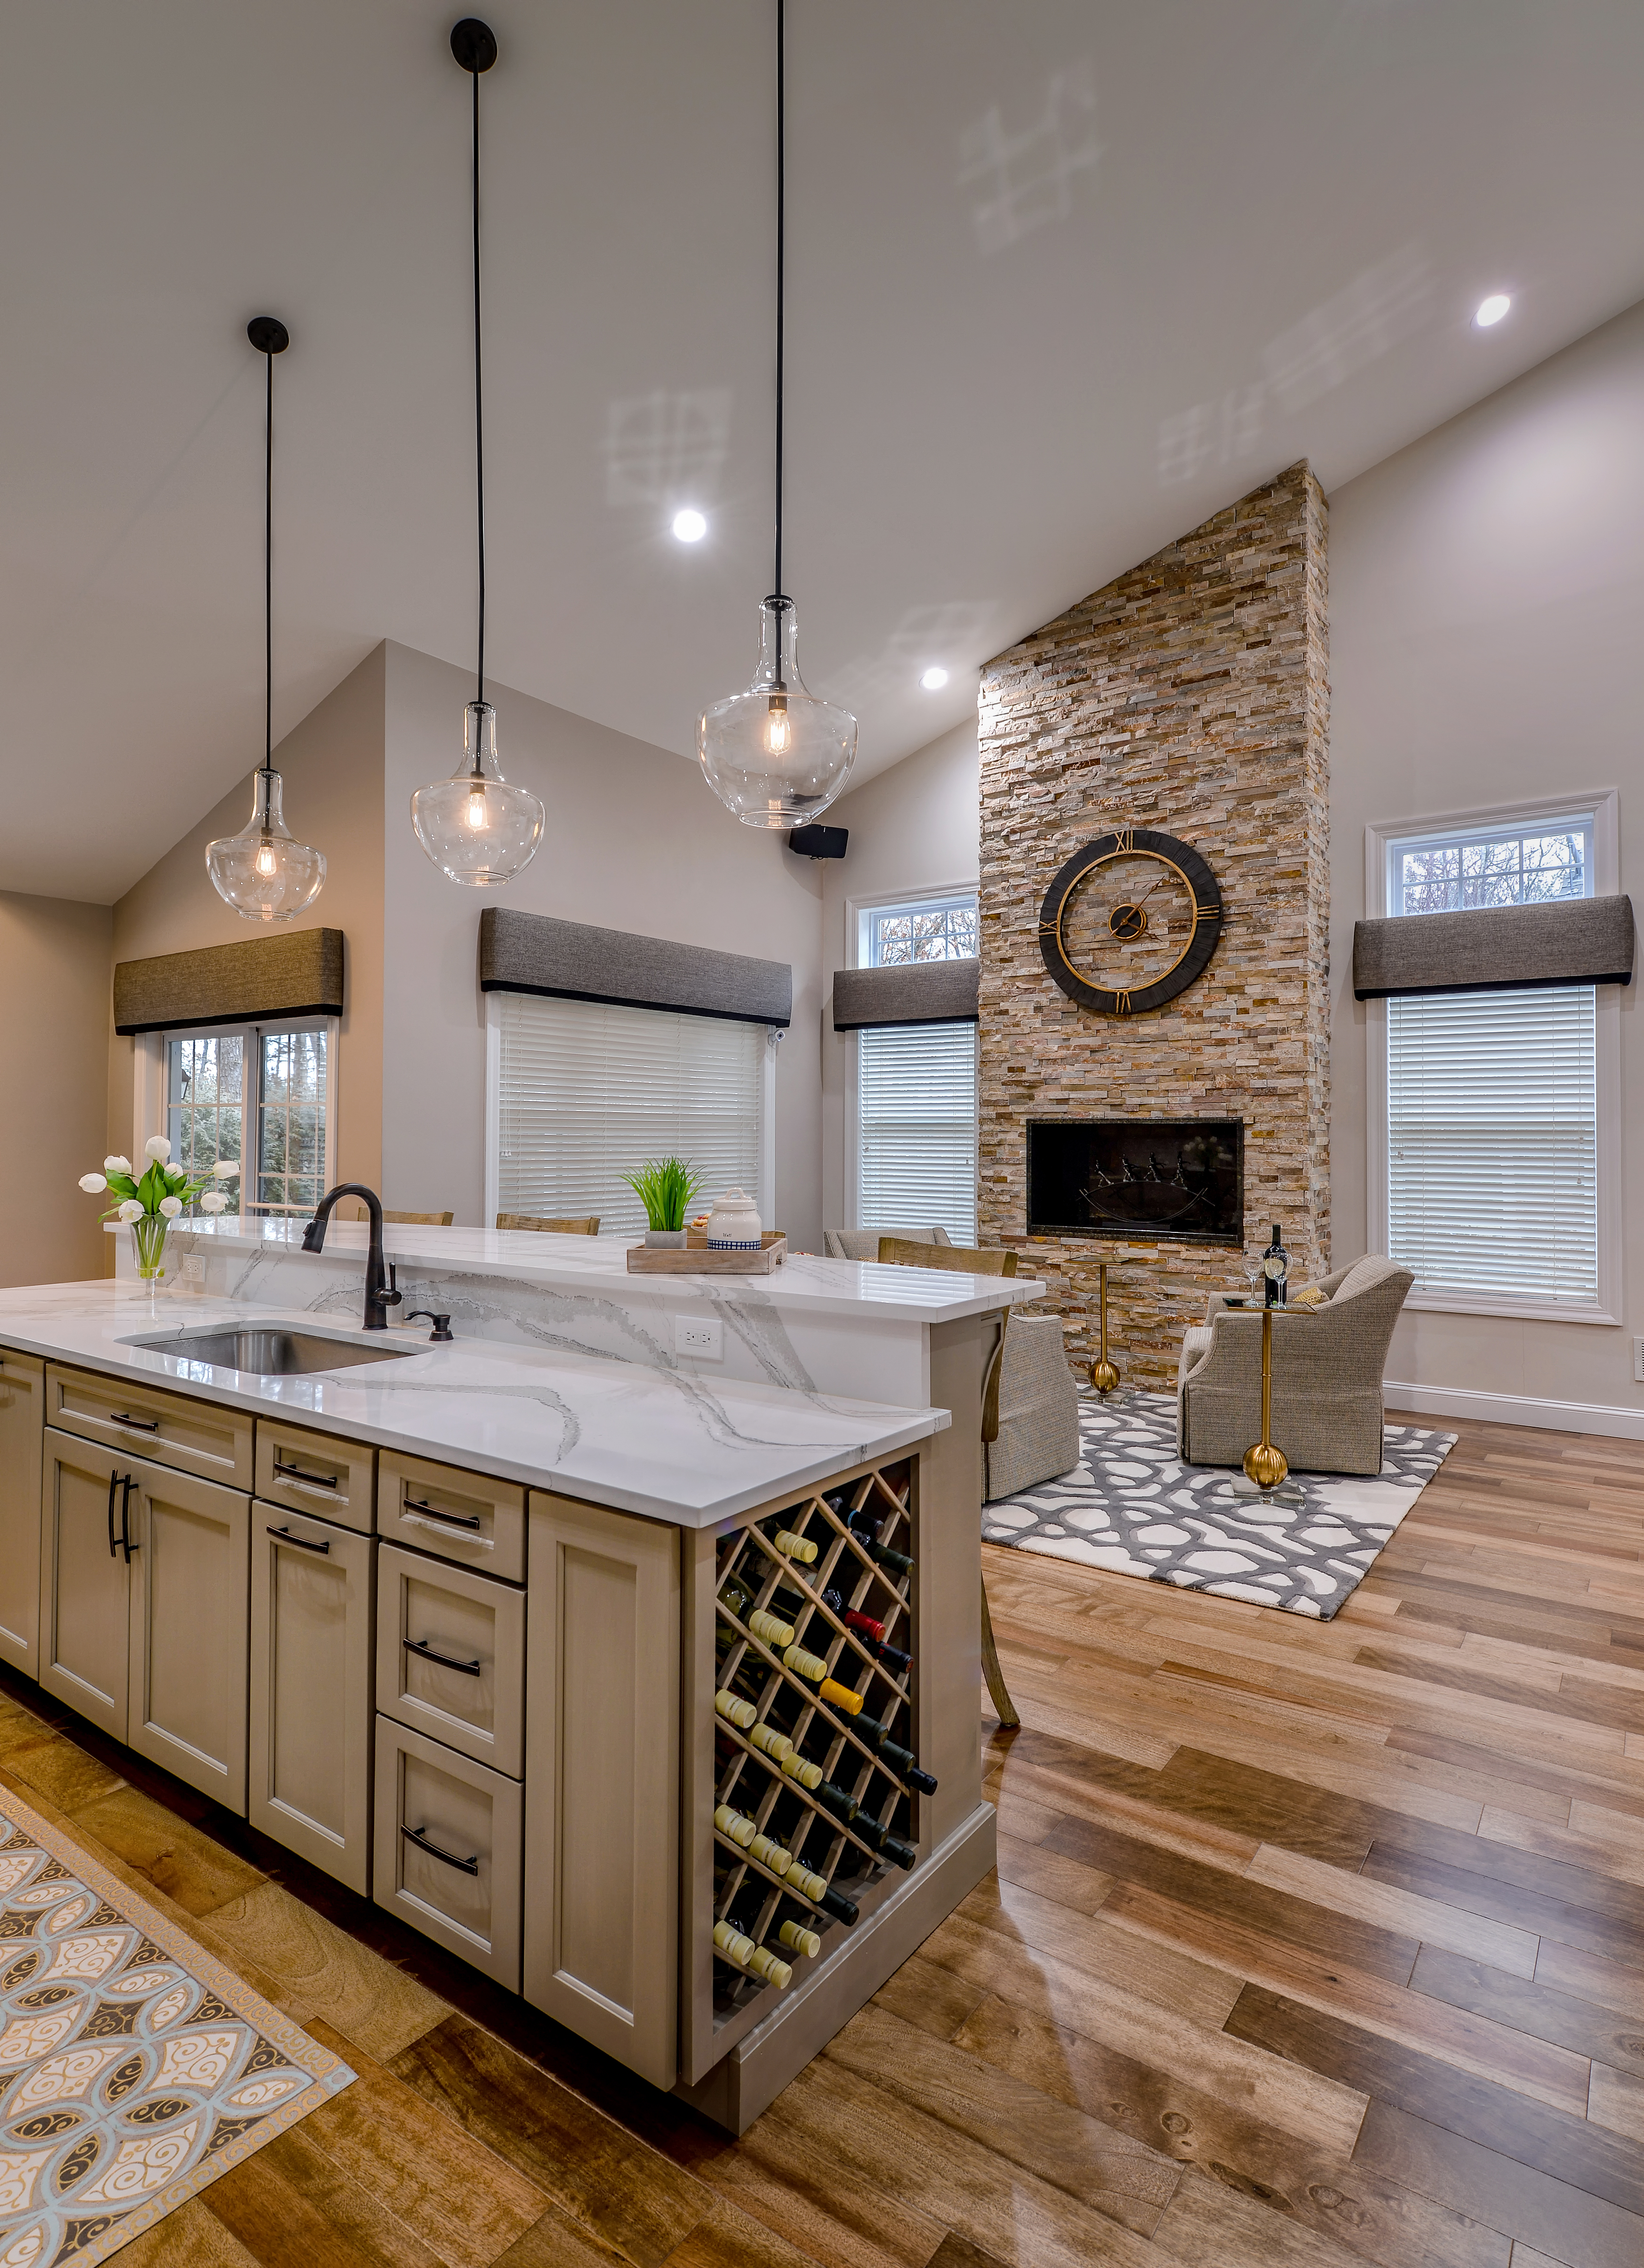 Fireplace Area & Kitchen